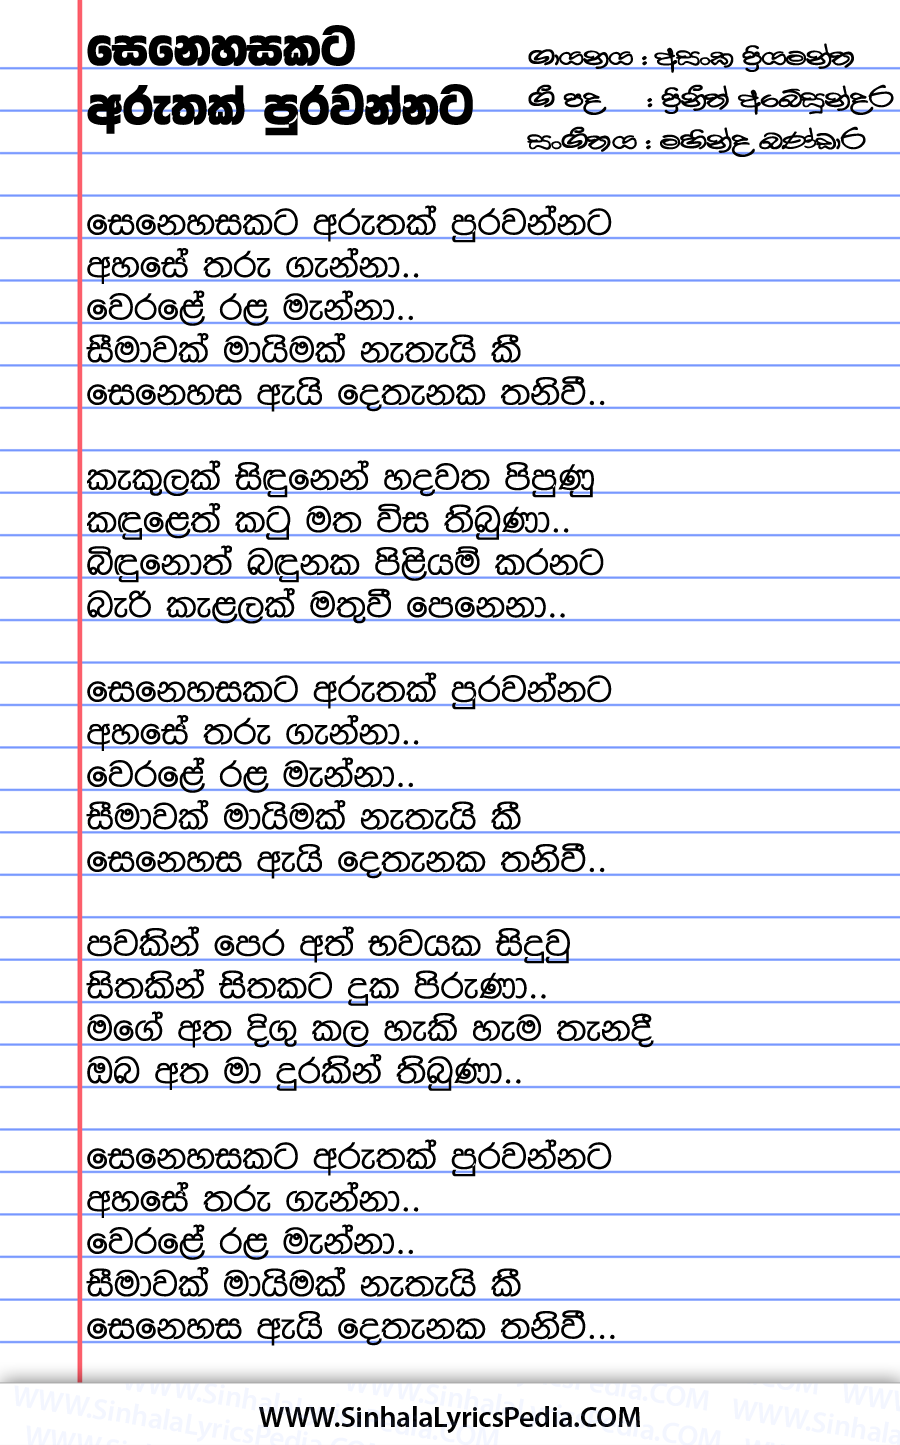 Senehasakata Aruthak Purawannata Song Lyrics